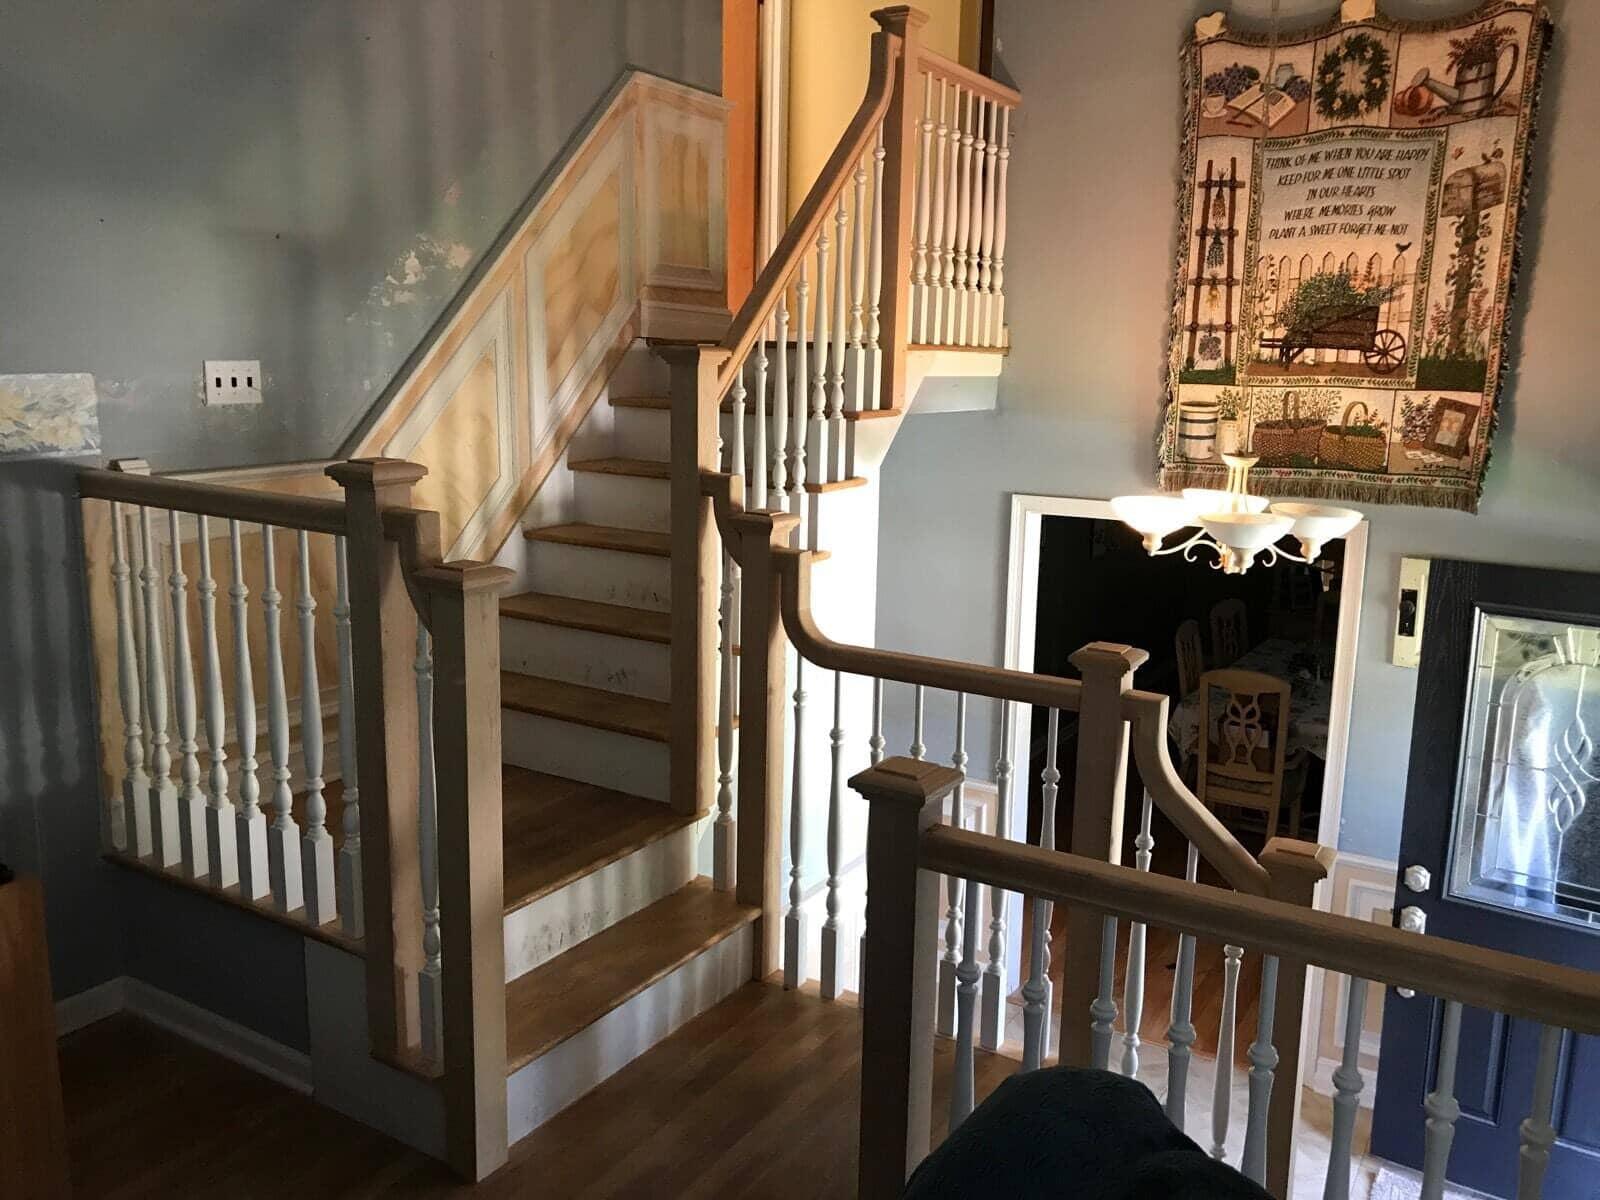 Stairs And Railings U2013 Jackson, NJ   DMD Stairs LLC